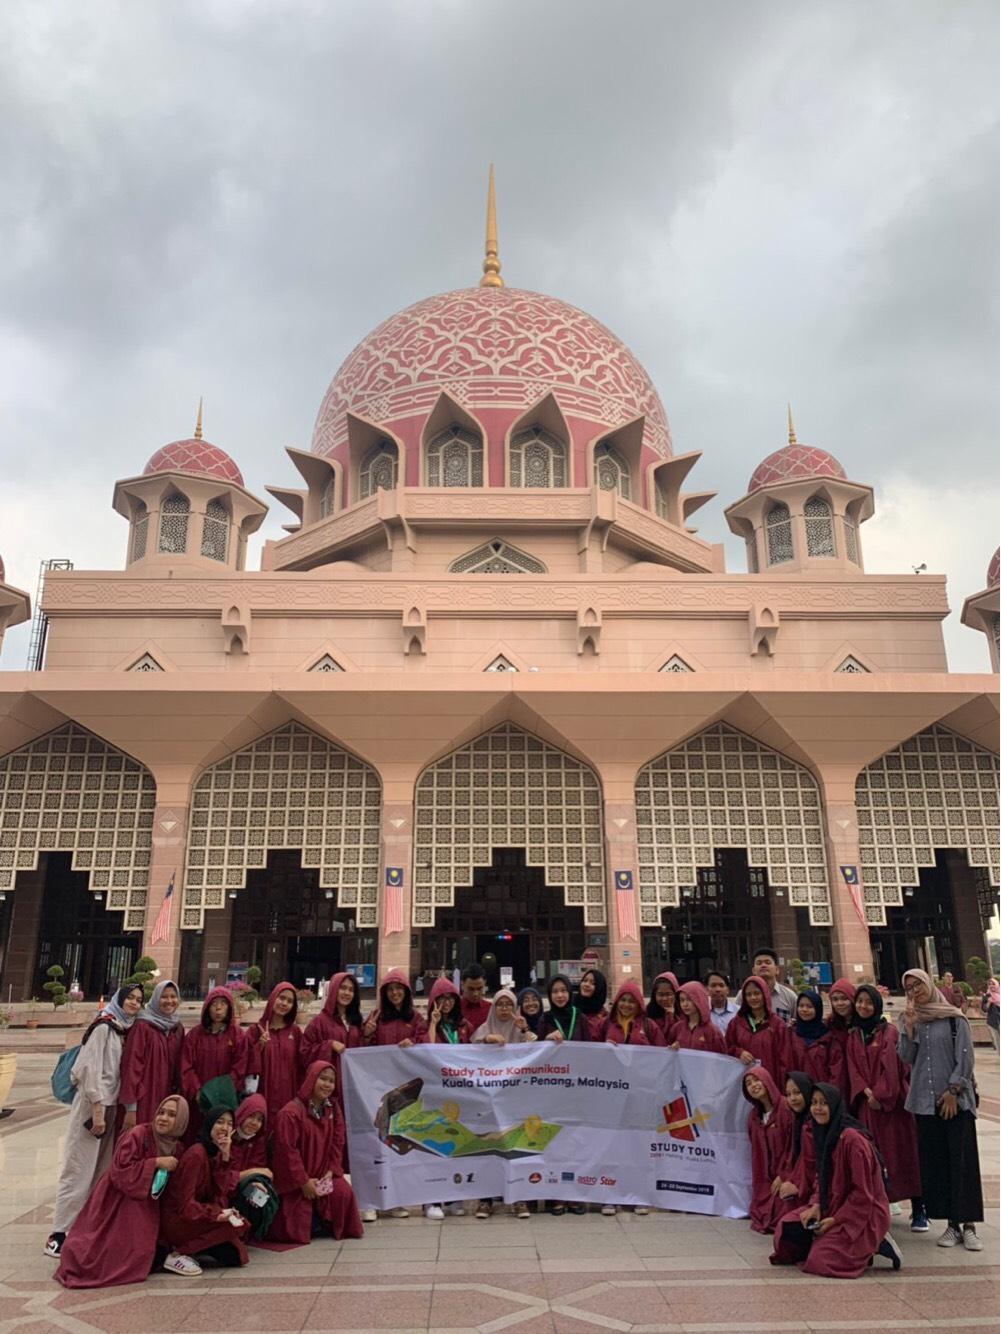 Study Tour Komunikasi USU 2019 mengunjungi Mesjid Putra Jaya pada (26/09) di Malaysia Sumber: Dokumentasi Panitia